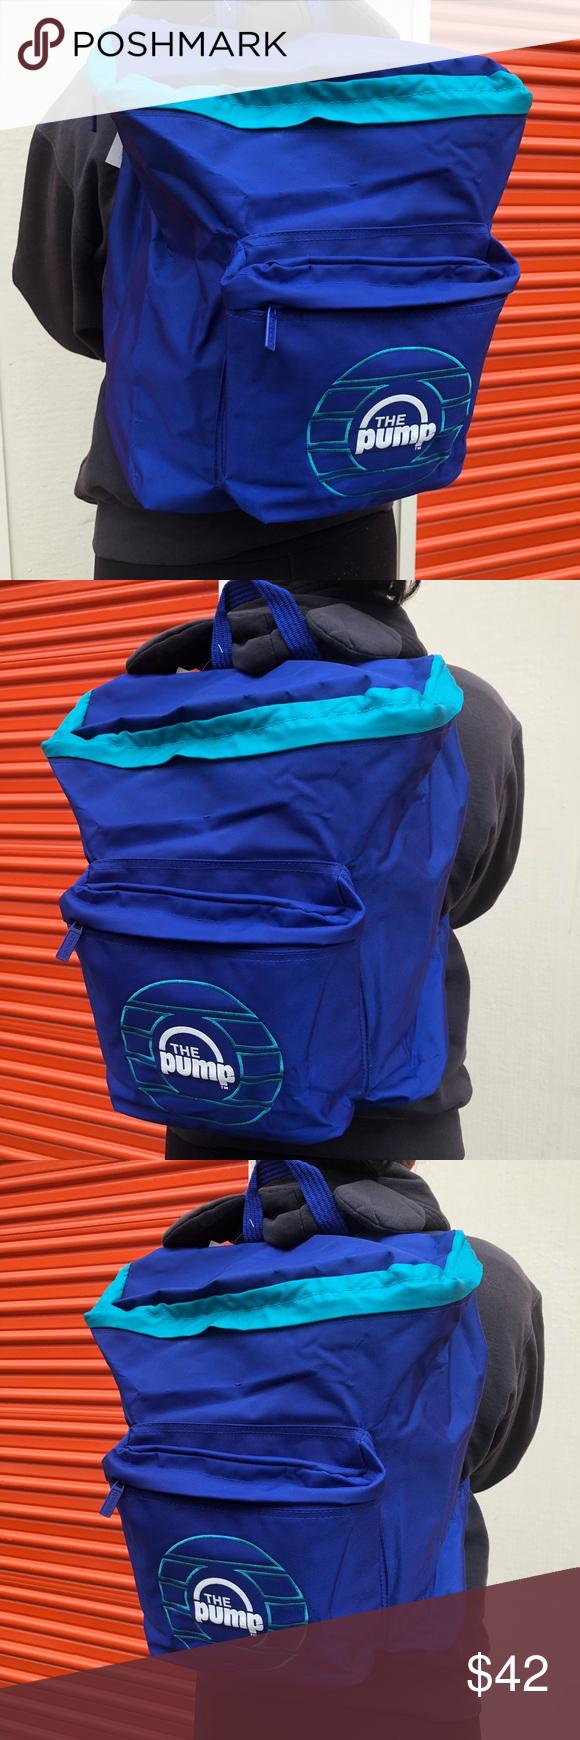 Semicírculo prueba Contribuir  REEBOK THE PUMP BLUE BACKPACK 🎒 FULL SIZE BAG Full size Reebok backpack  Reebok Bags | Blue backpack, Blue pumps, Pumps